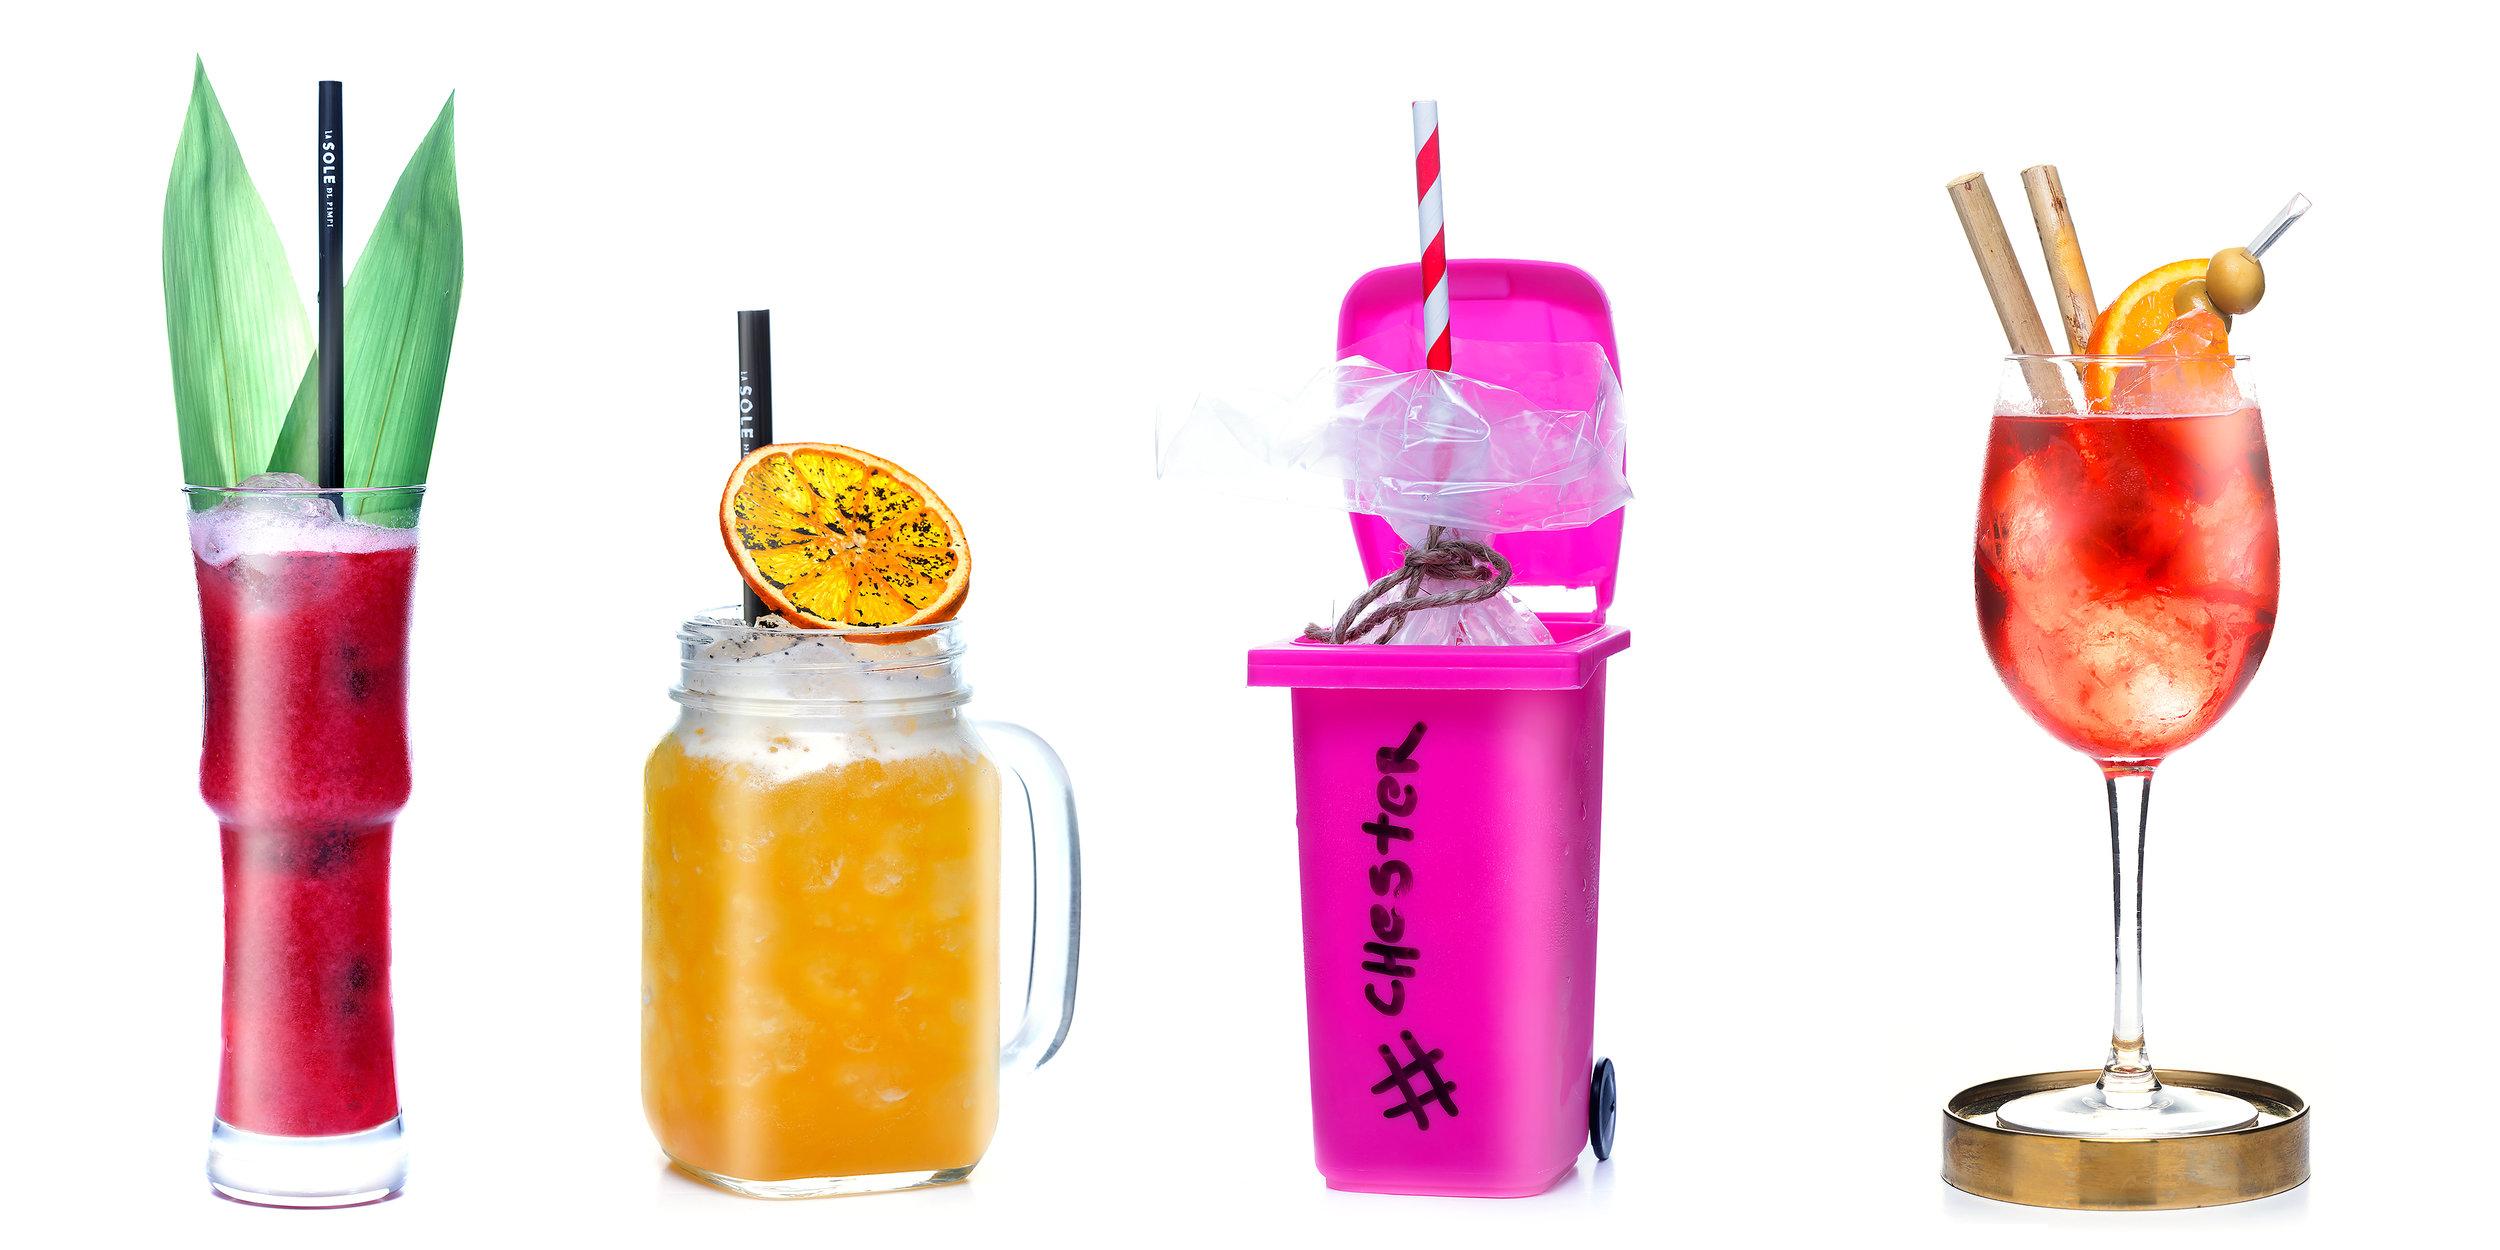 bebidas-drinks-cocktails-cocteles-photographer-fotografo-photography-fotografia-mixology-bartending-La-Sole-del-Pimpi-Malaga-Sr-Erreka-Photo-diego-erreka-shakti-de-raco-españa-spain-producto.jpg